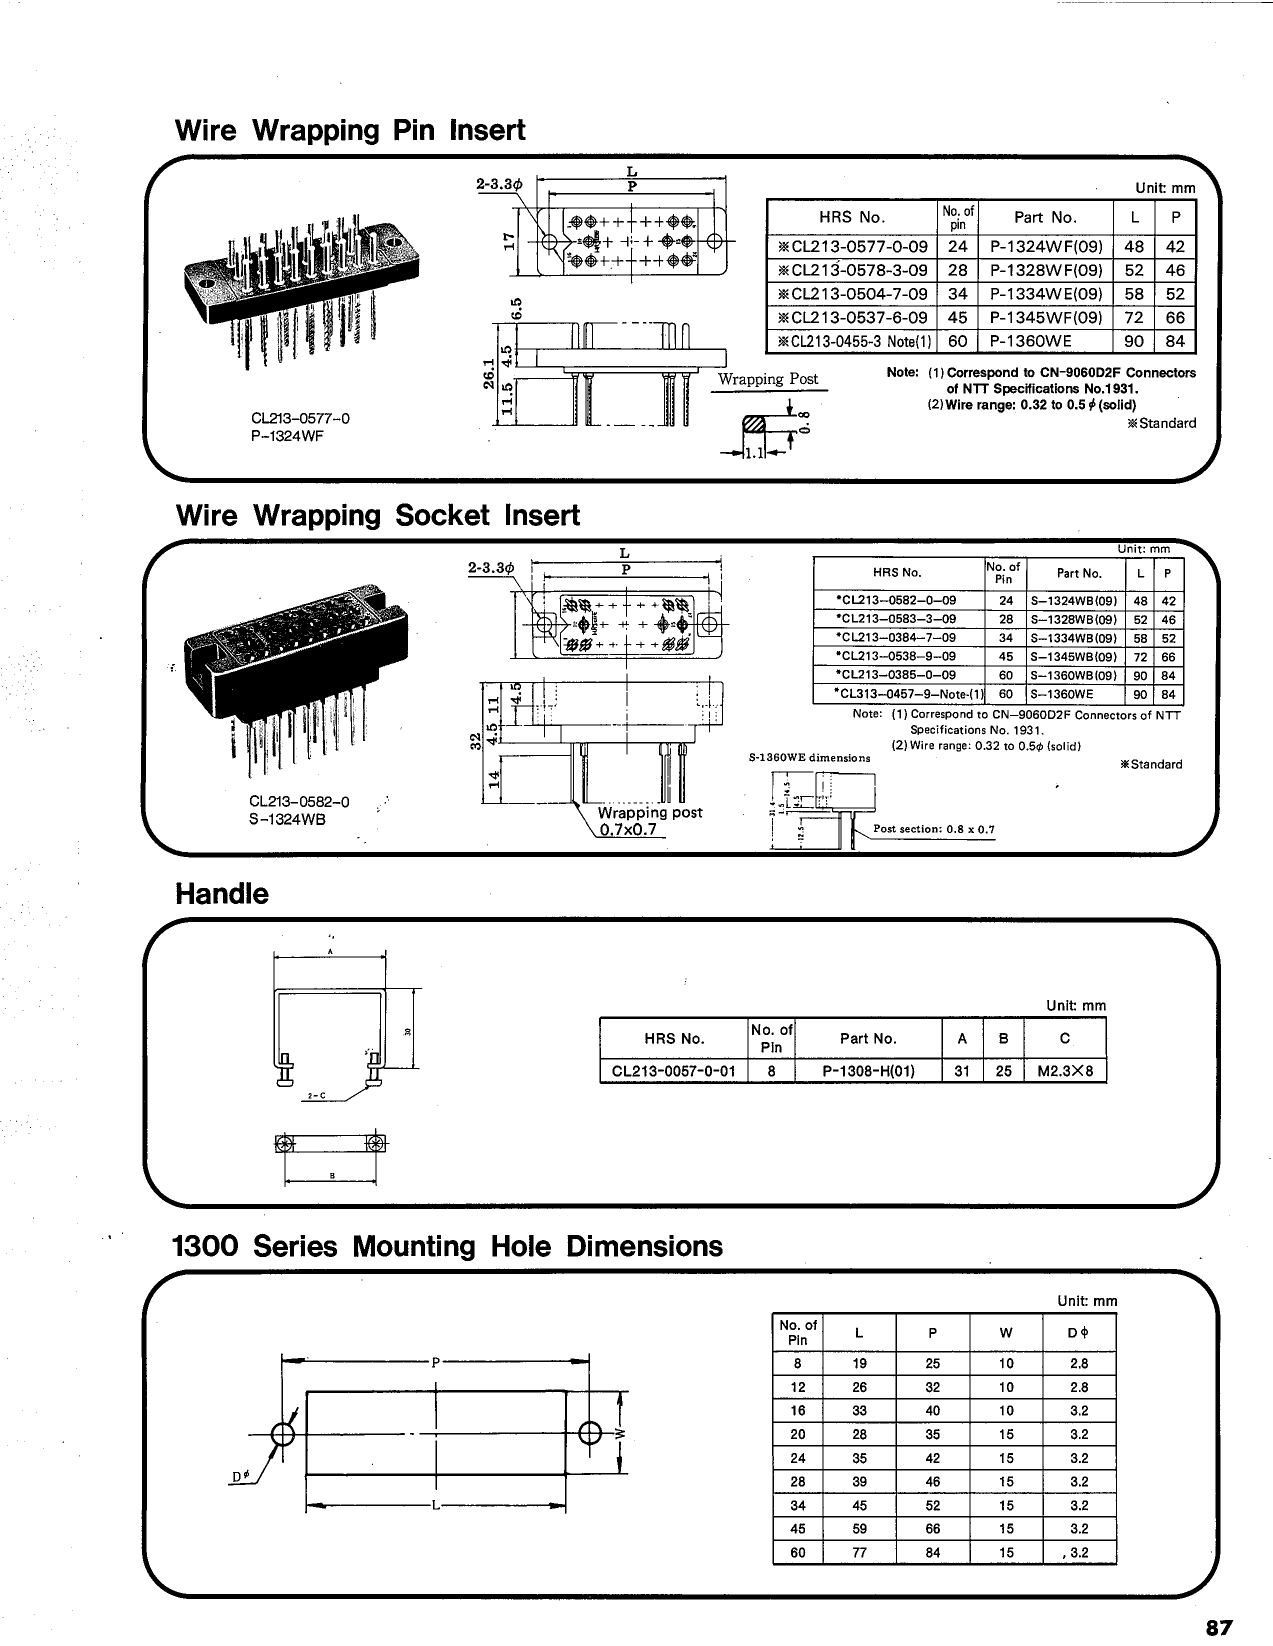 P-1345W-CT 電子部品, 半導体